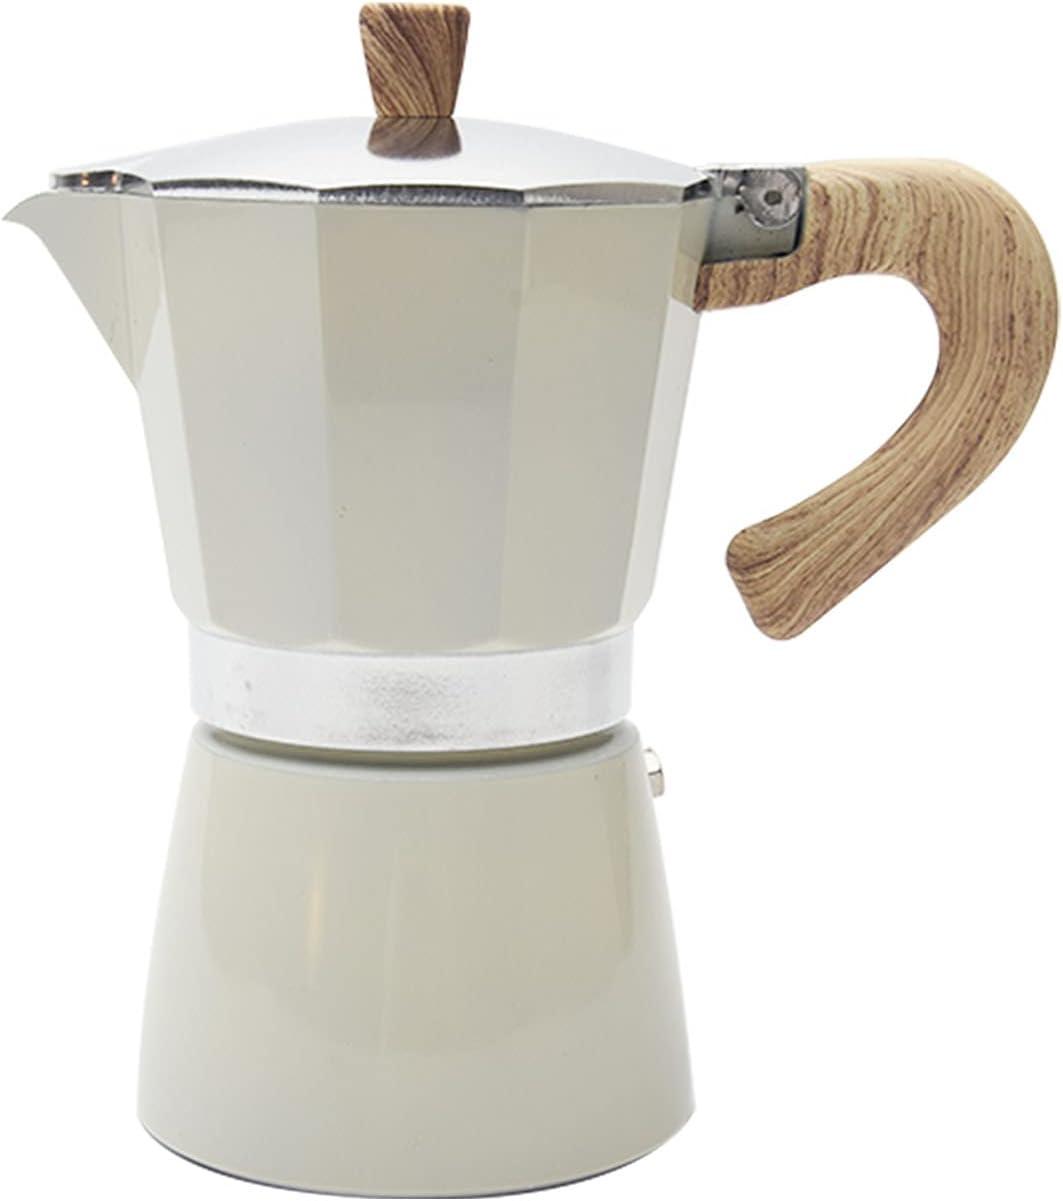 Stovetop Espresso Maker Same day Max 50% OFF shipping 300ml Mocha Aluminum Multifunction Pot